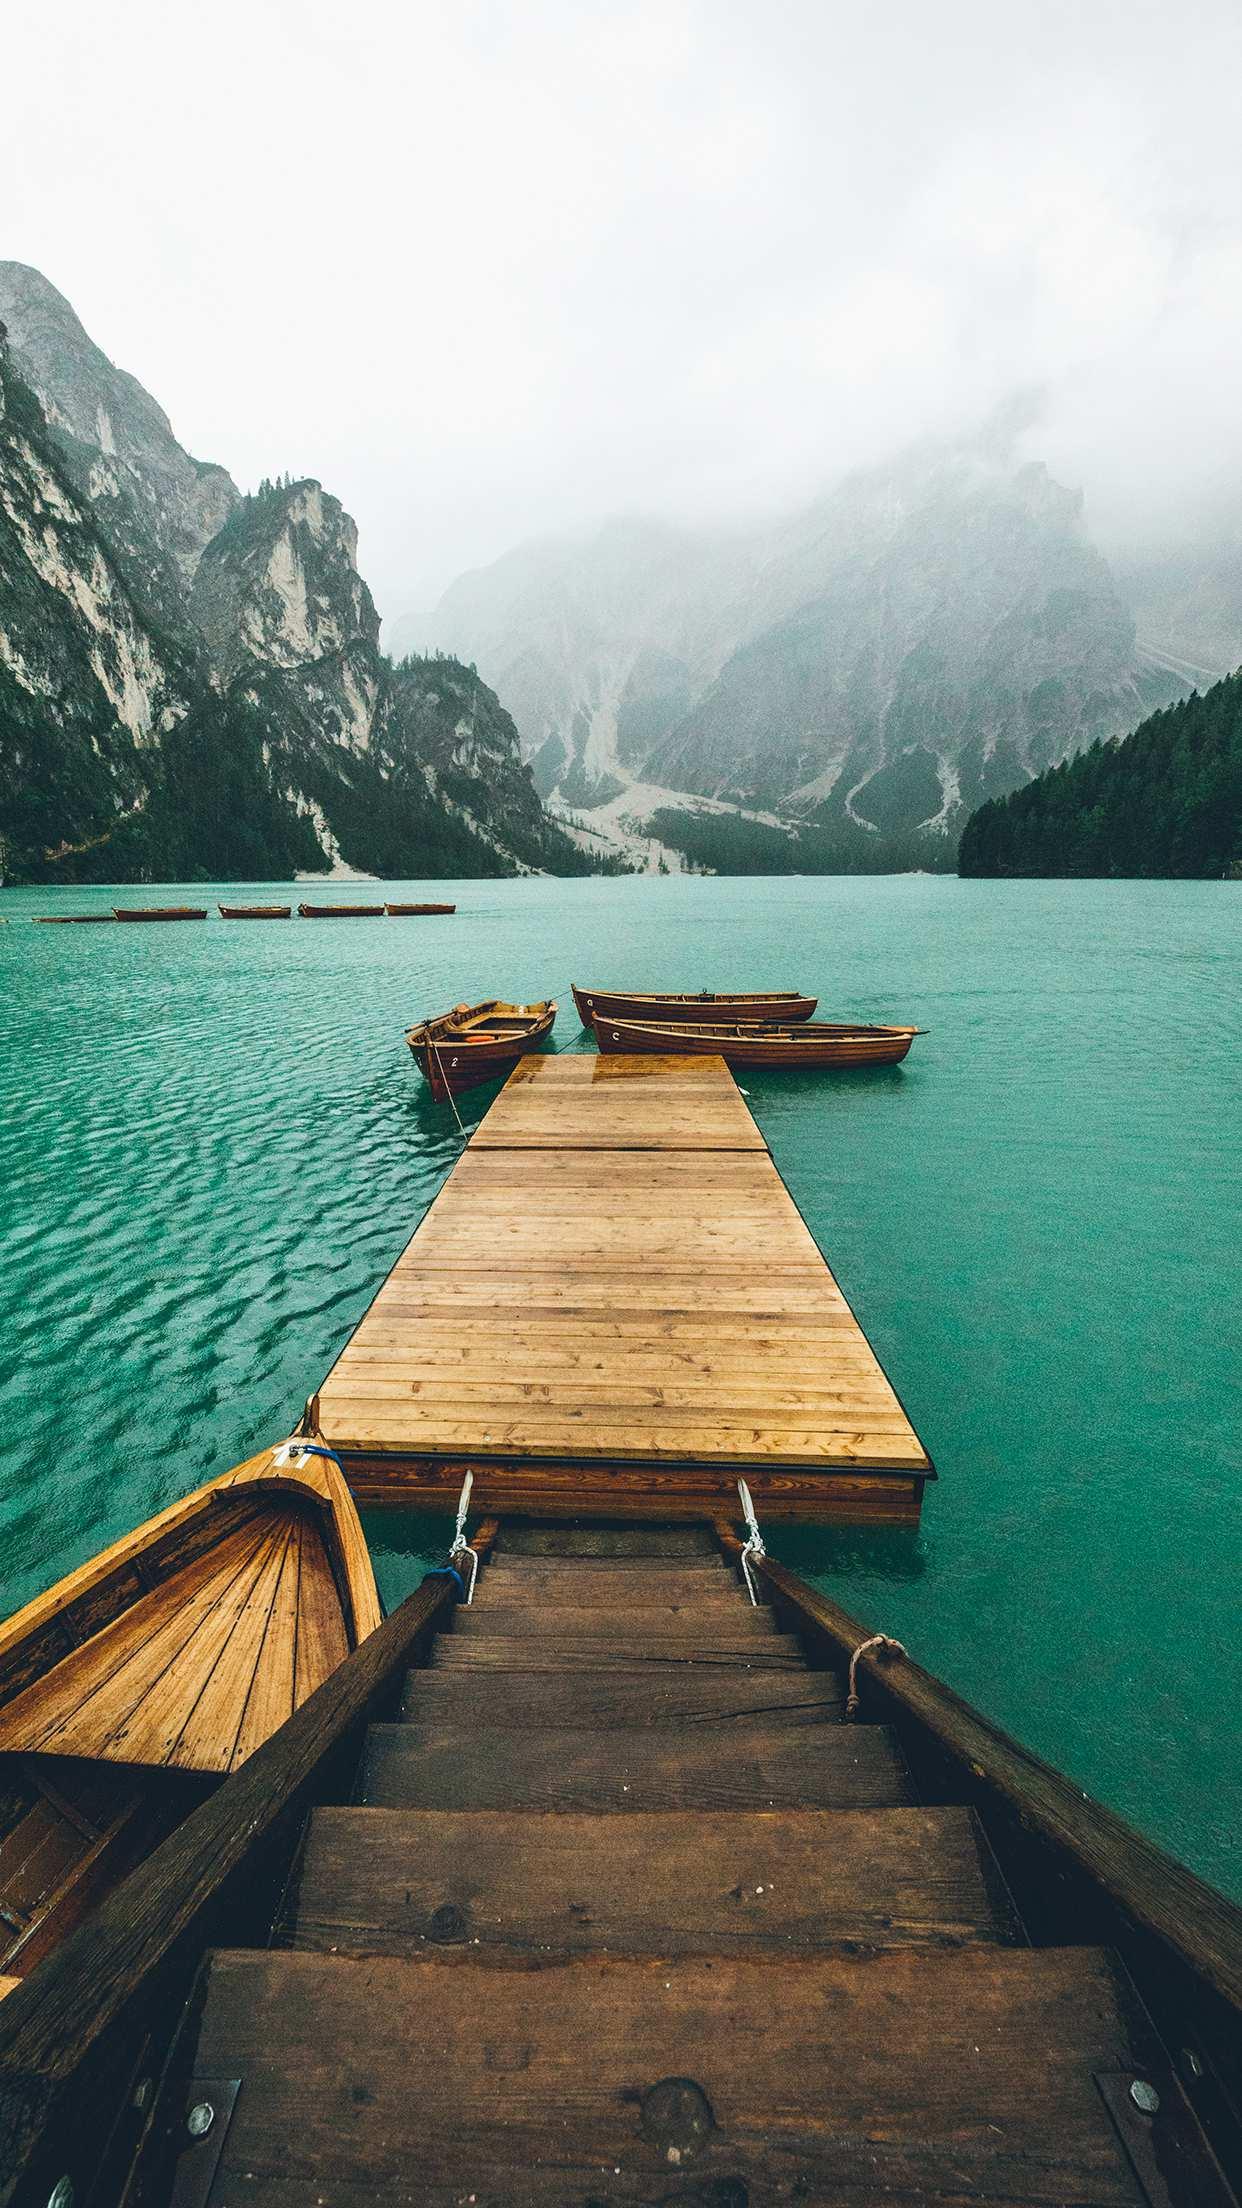 Pier Boats Nature Lake iPhone Wallpaper